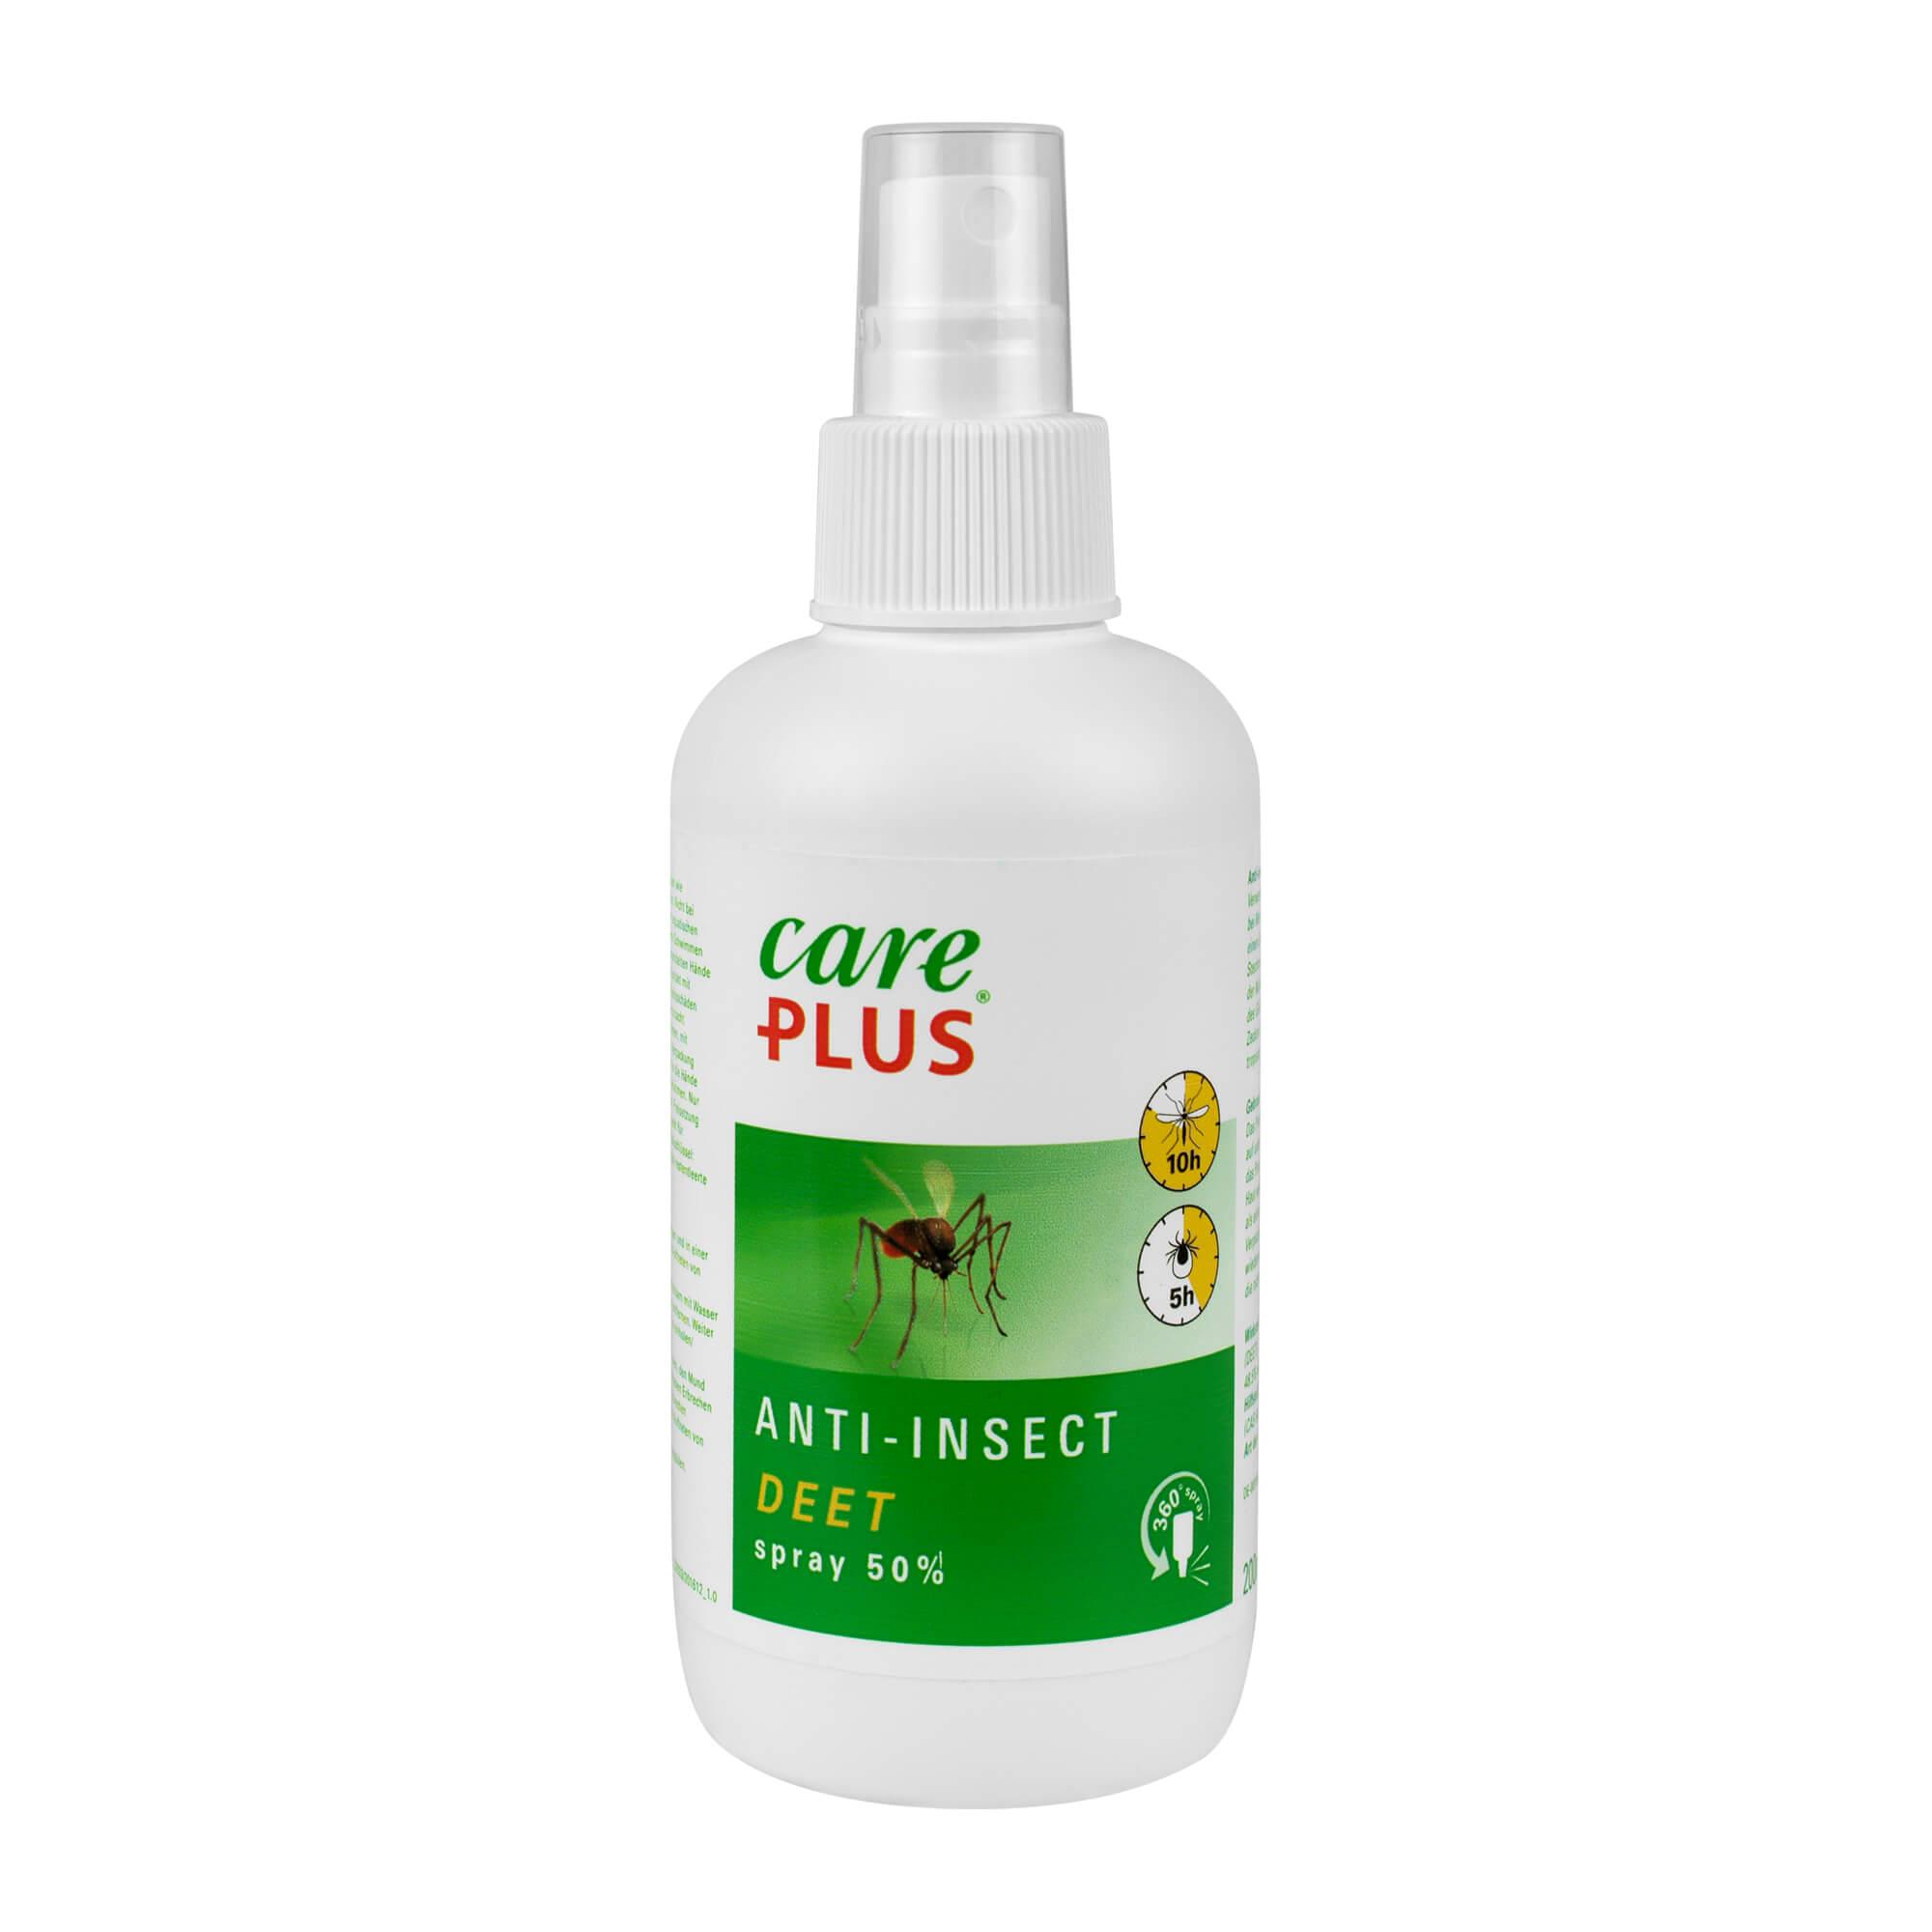 Care Plus Anti-Insect Dett Spray 50 %